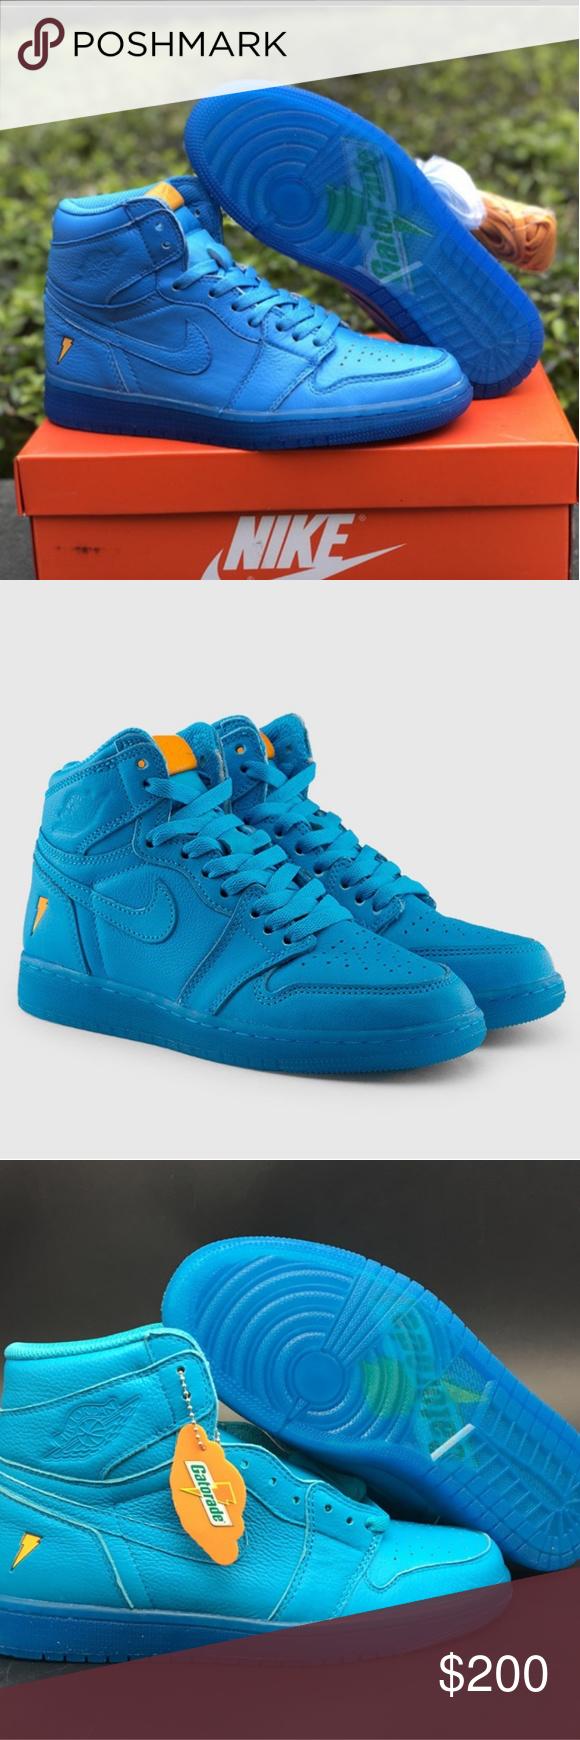 Nike Jordan Retro 1 Gatorade Nike. Jordan s High top Retro 1. Gatorade  Limited Edition f6c47bd30